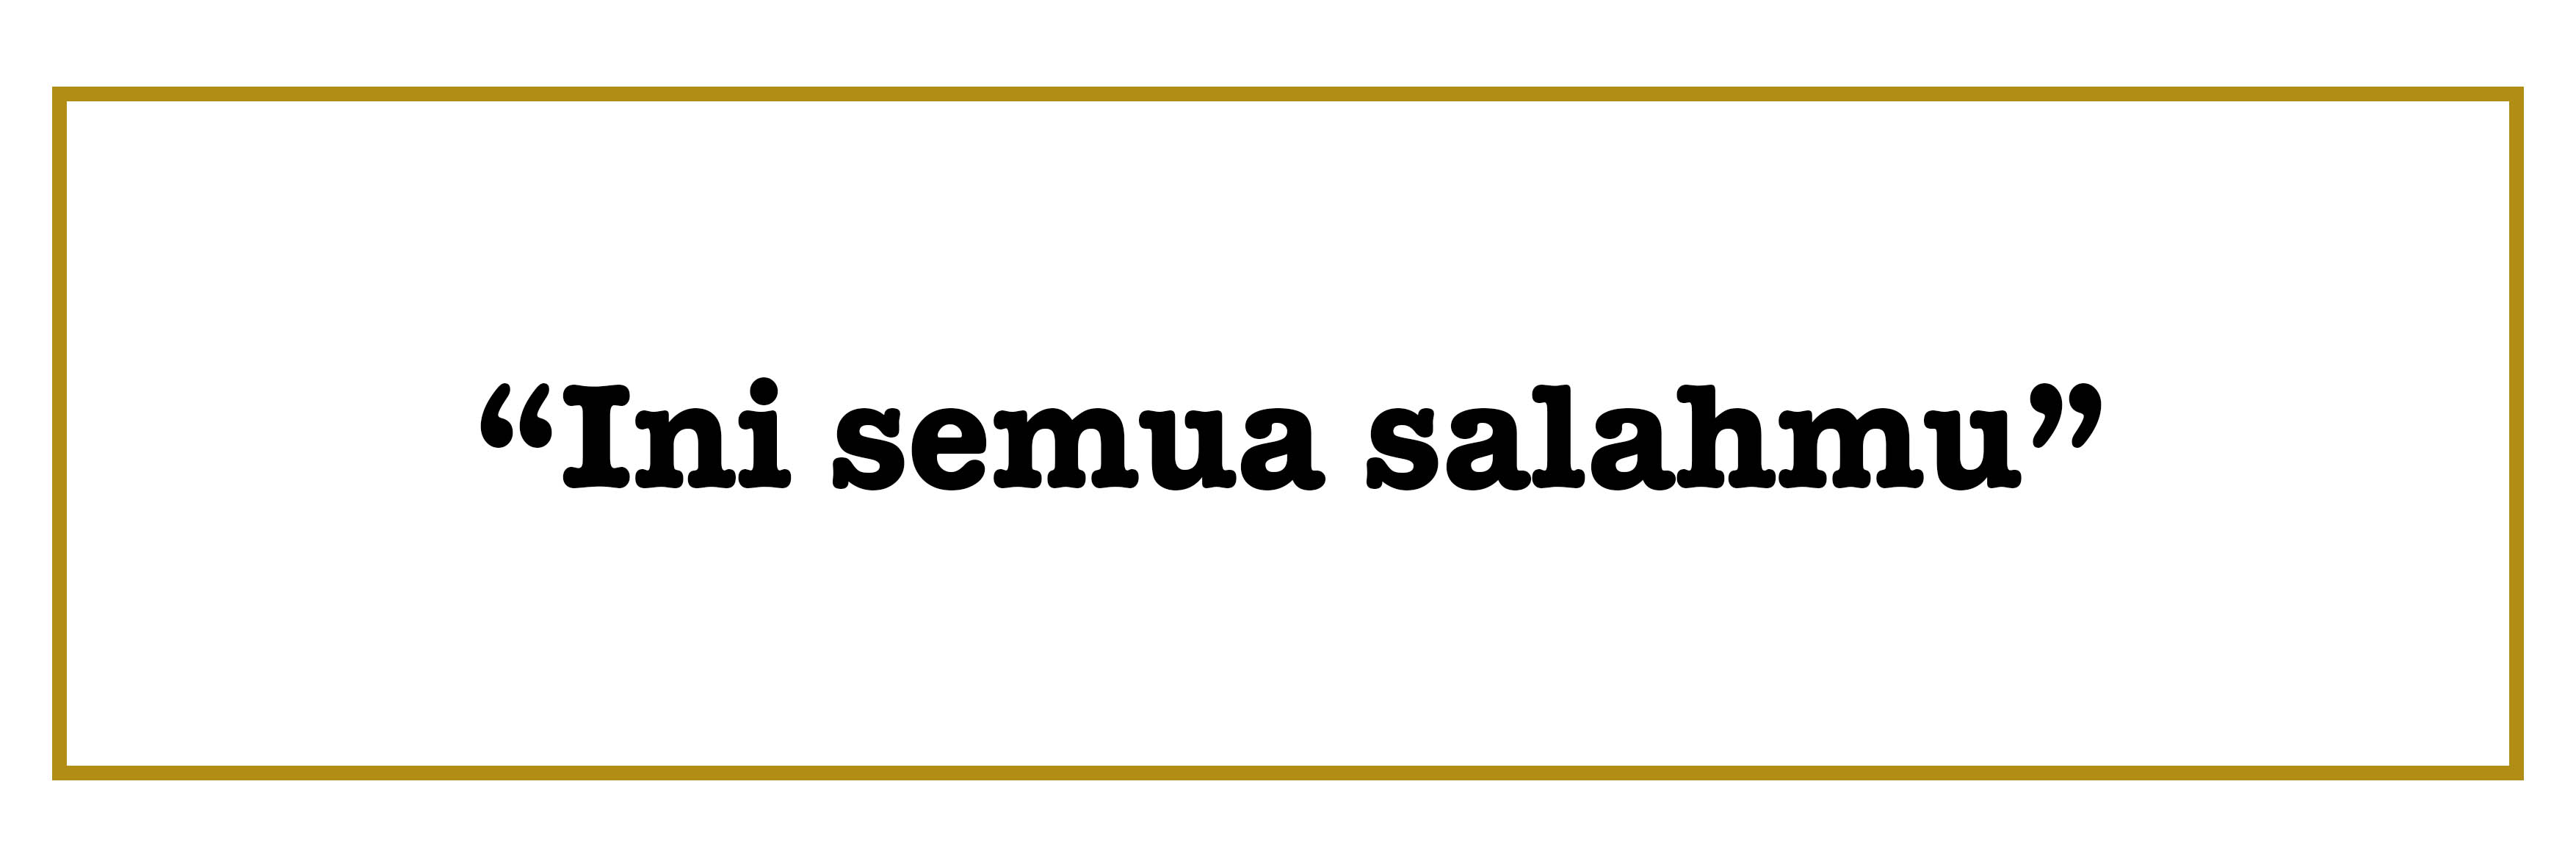 5 Kalimat Ini 'Haram' Kamu Ucapkan Saat Bertengkar